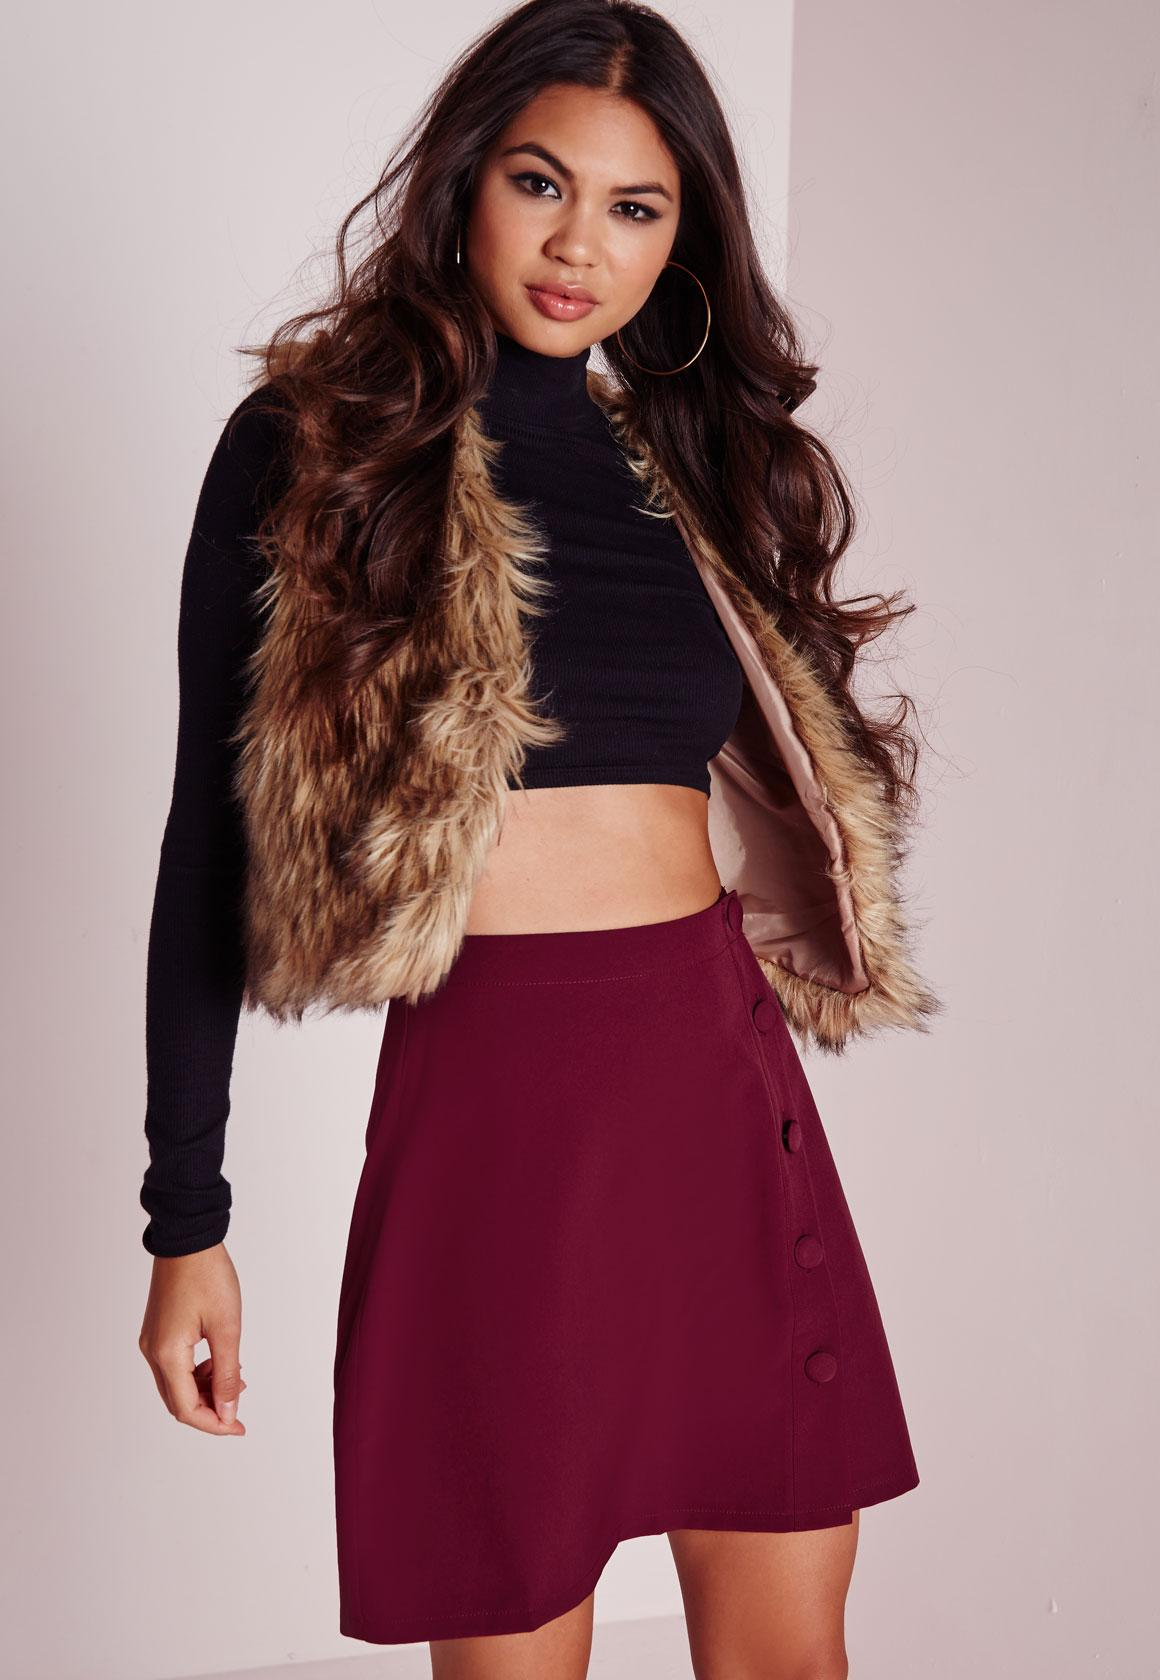 Button Detail A Line Mini Skirt Burgundy - Button - A - Line ...